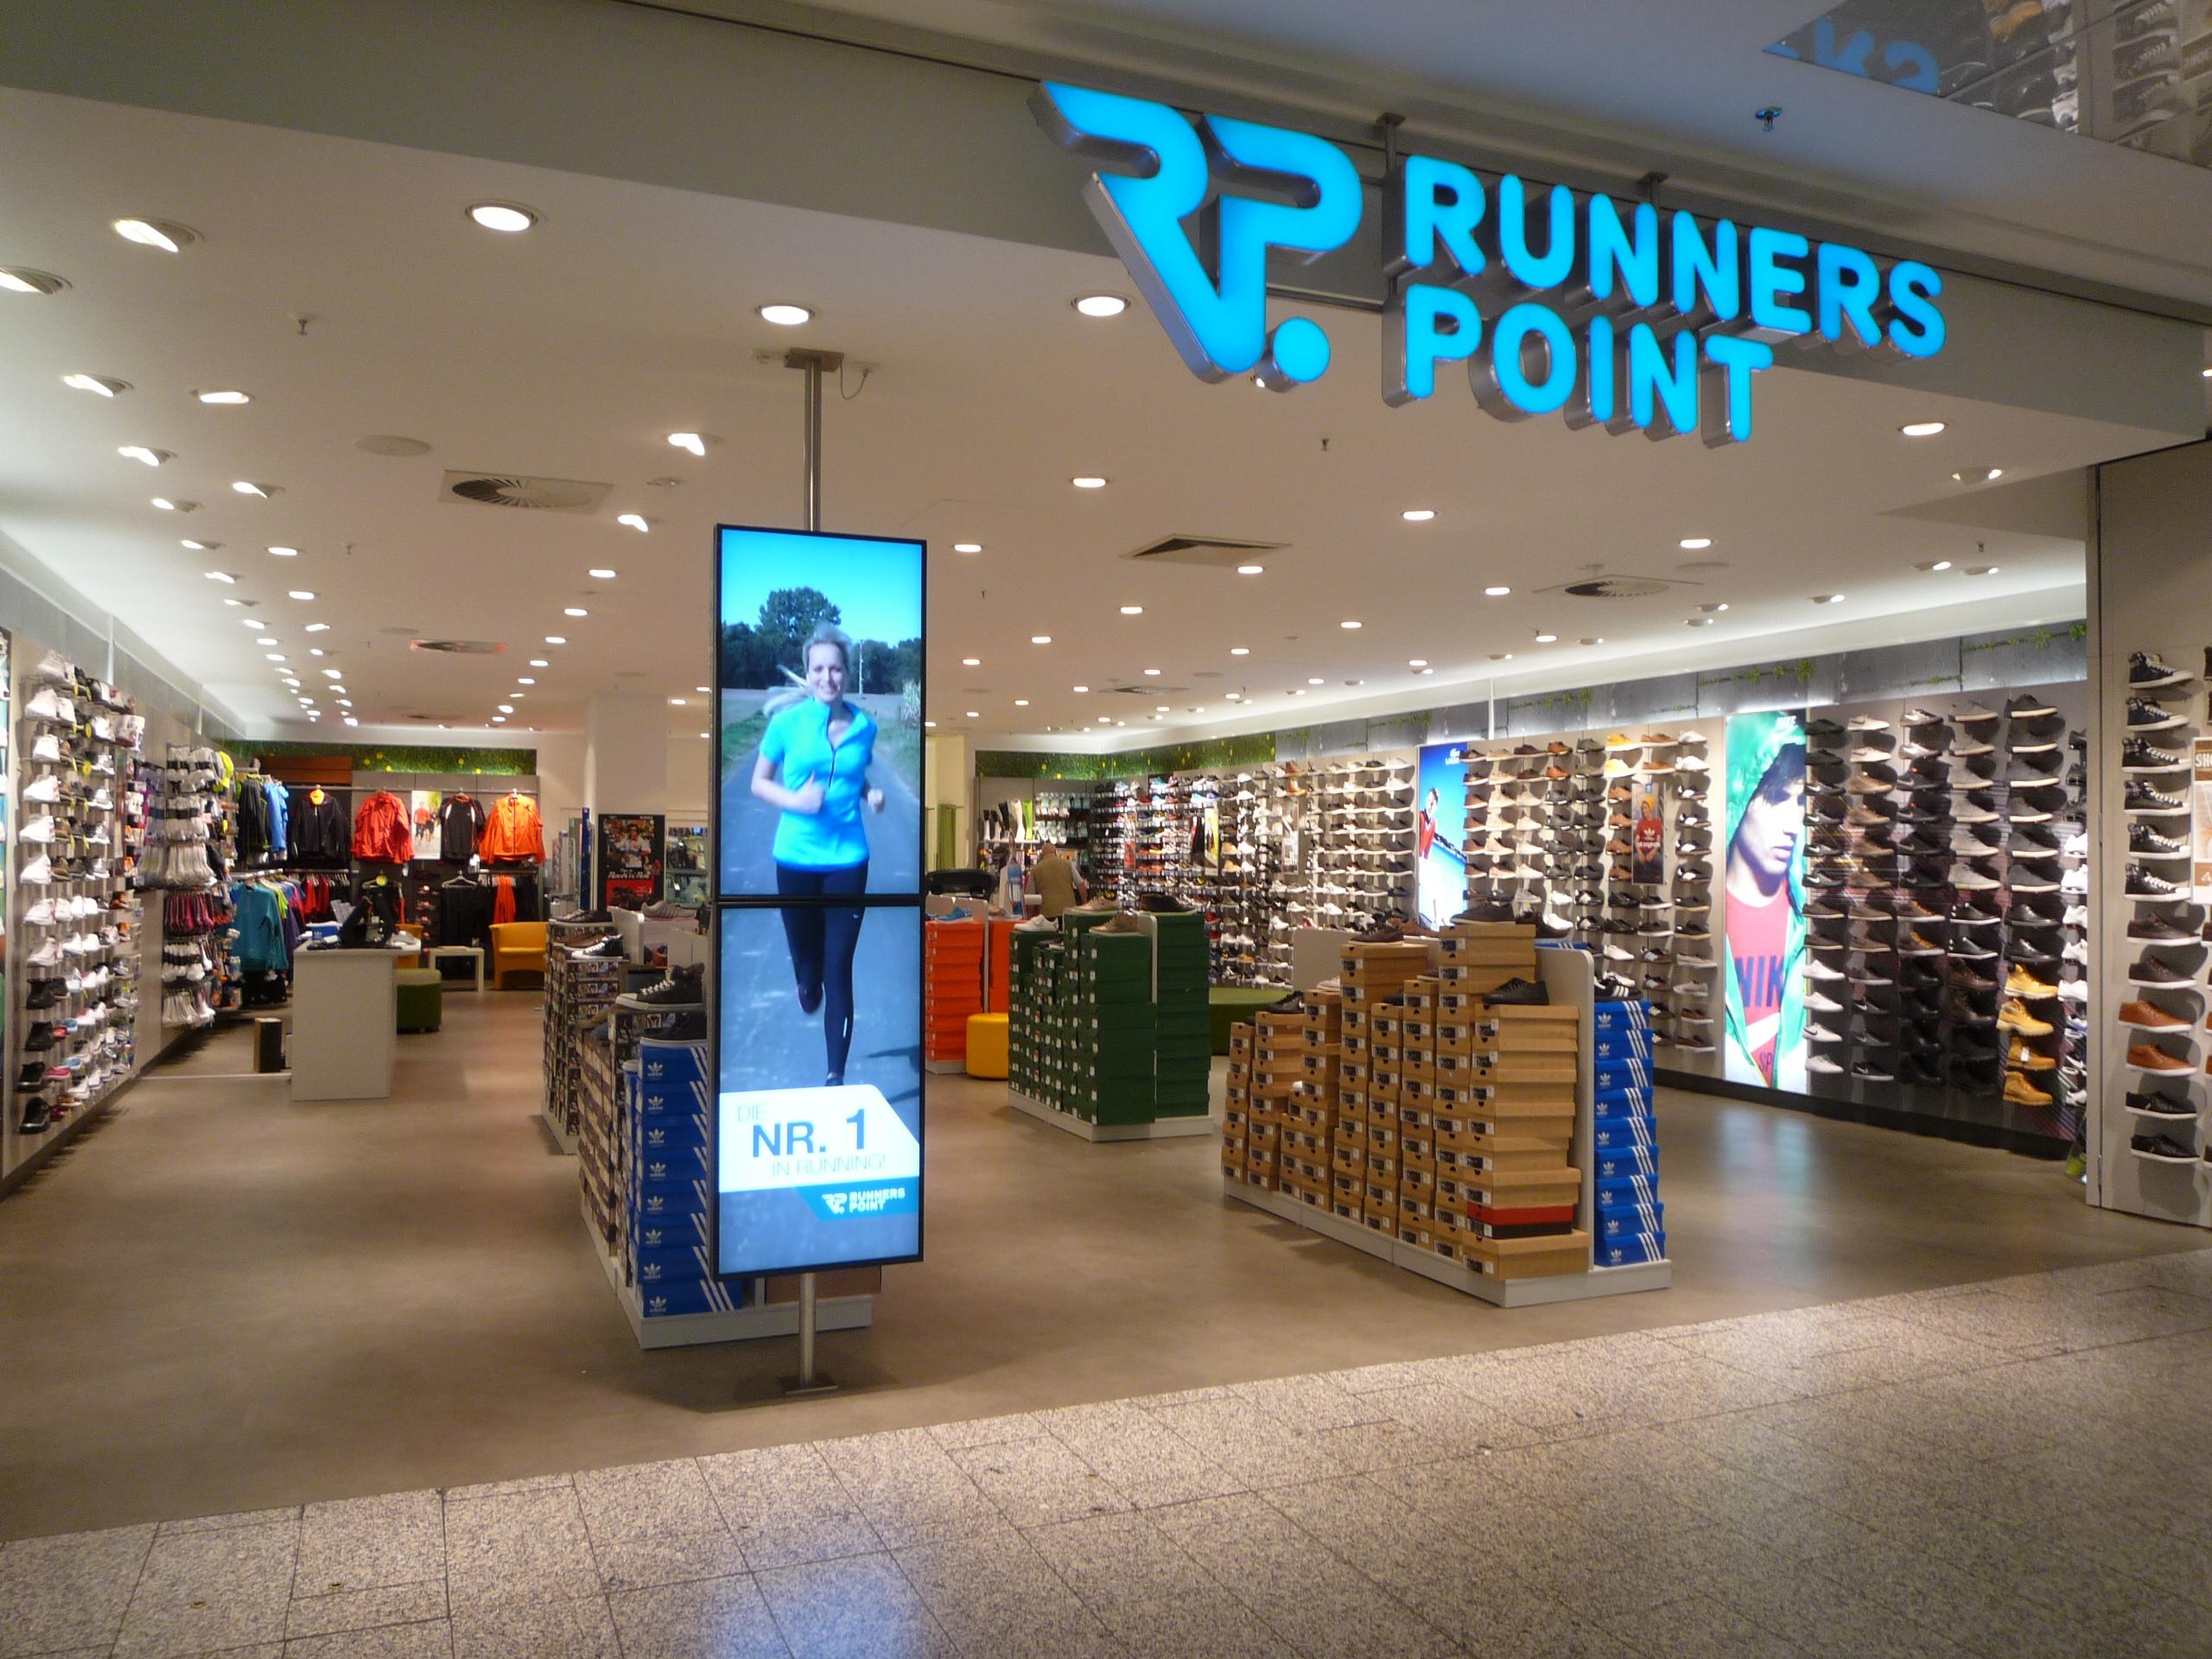 Runners Point Mönchengladbach